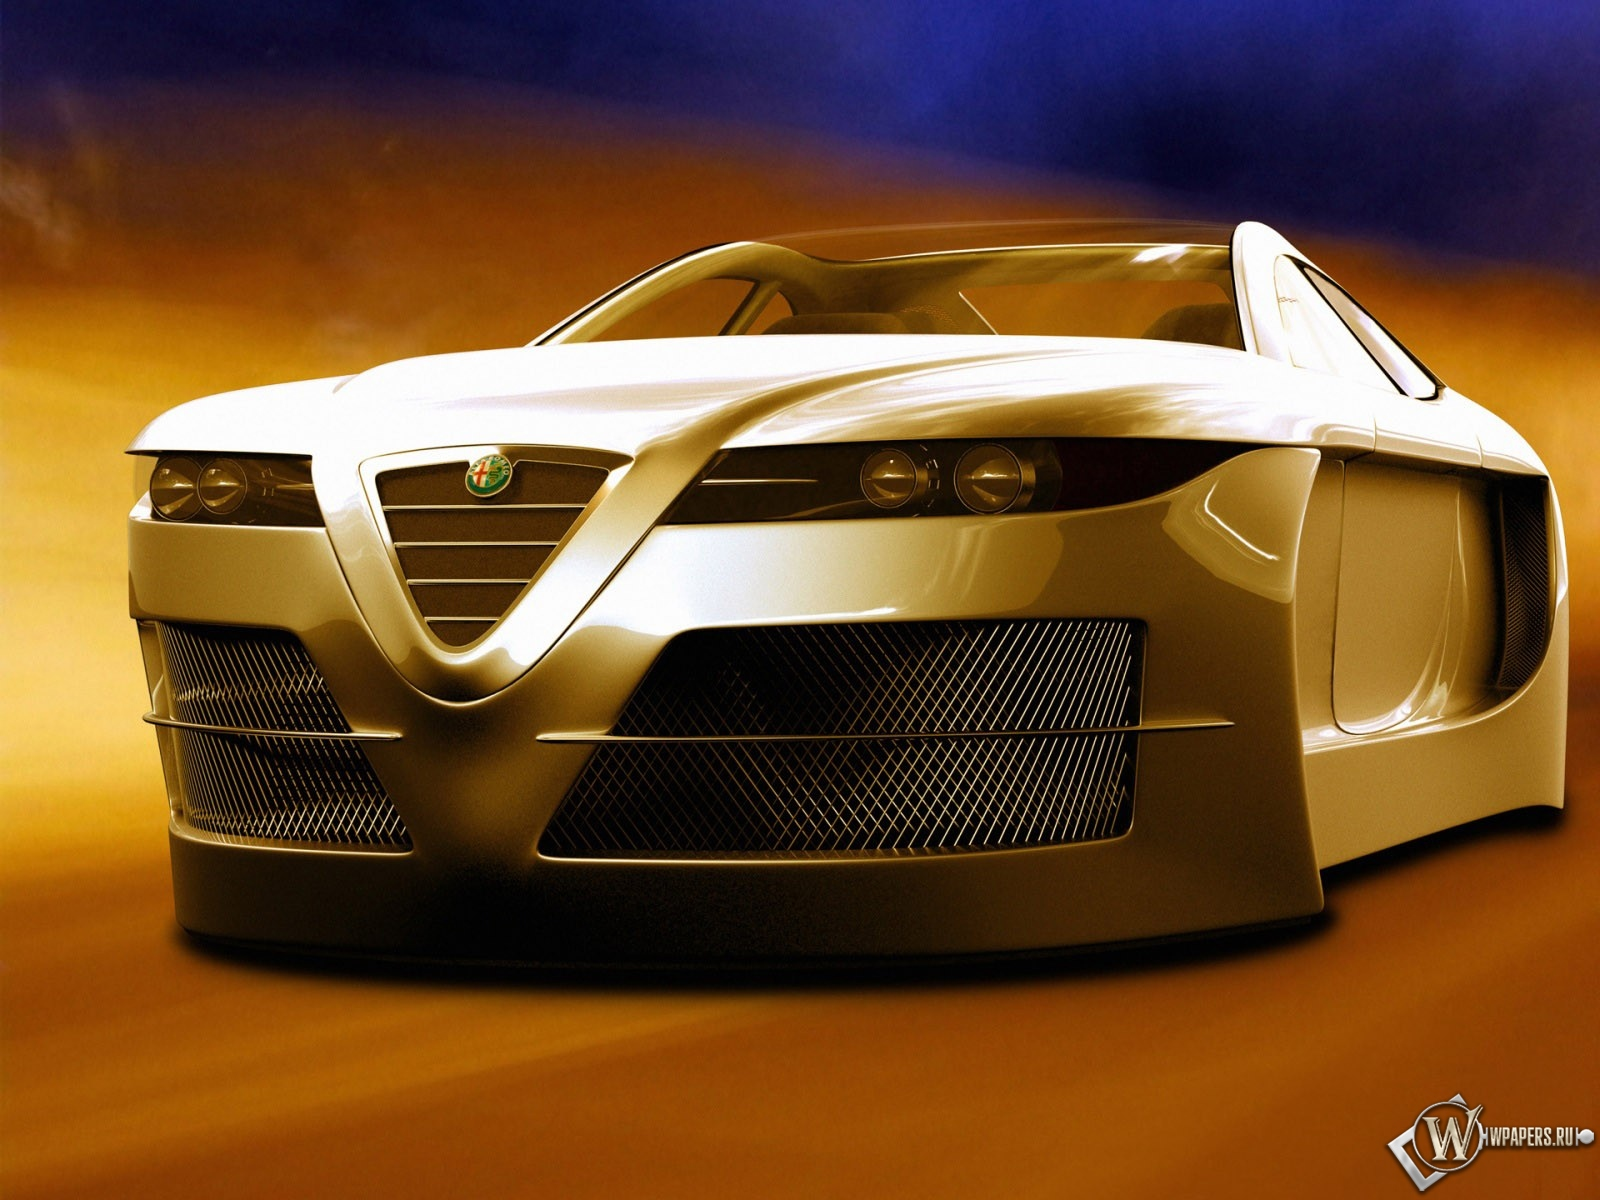 3D Альфа-Ромео 1600x1200